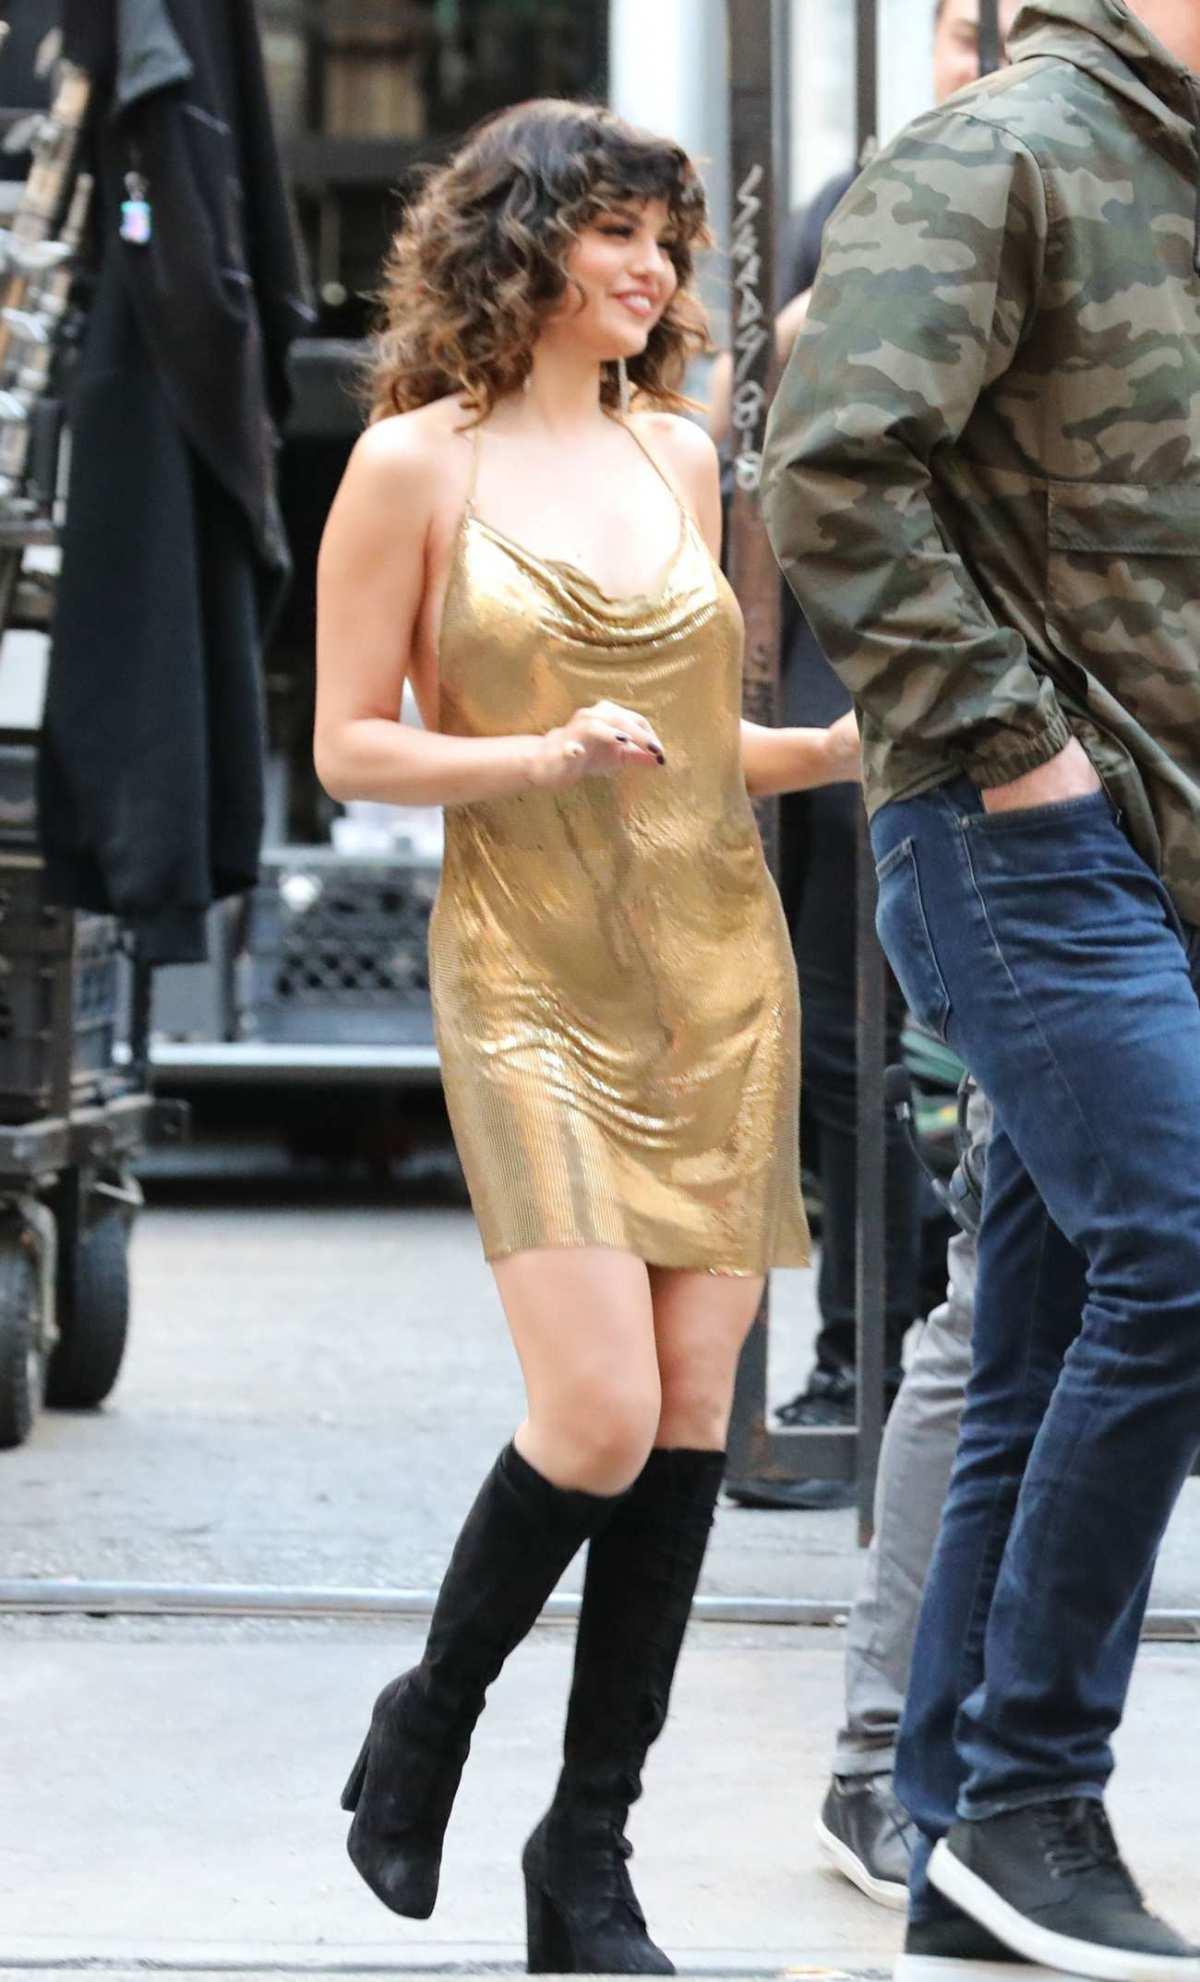 Selena Gomez Filming New Music Video on Jan 28